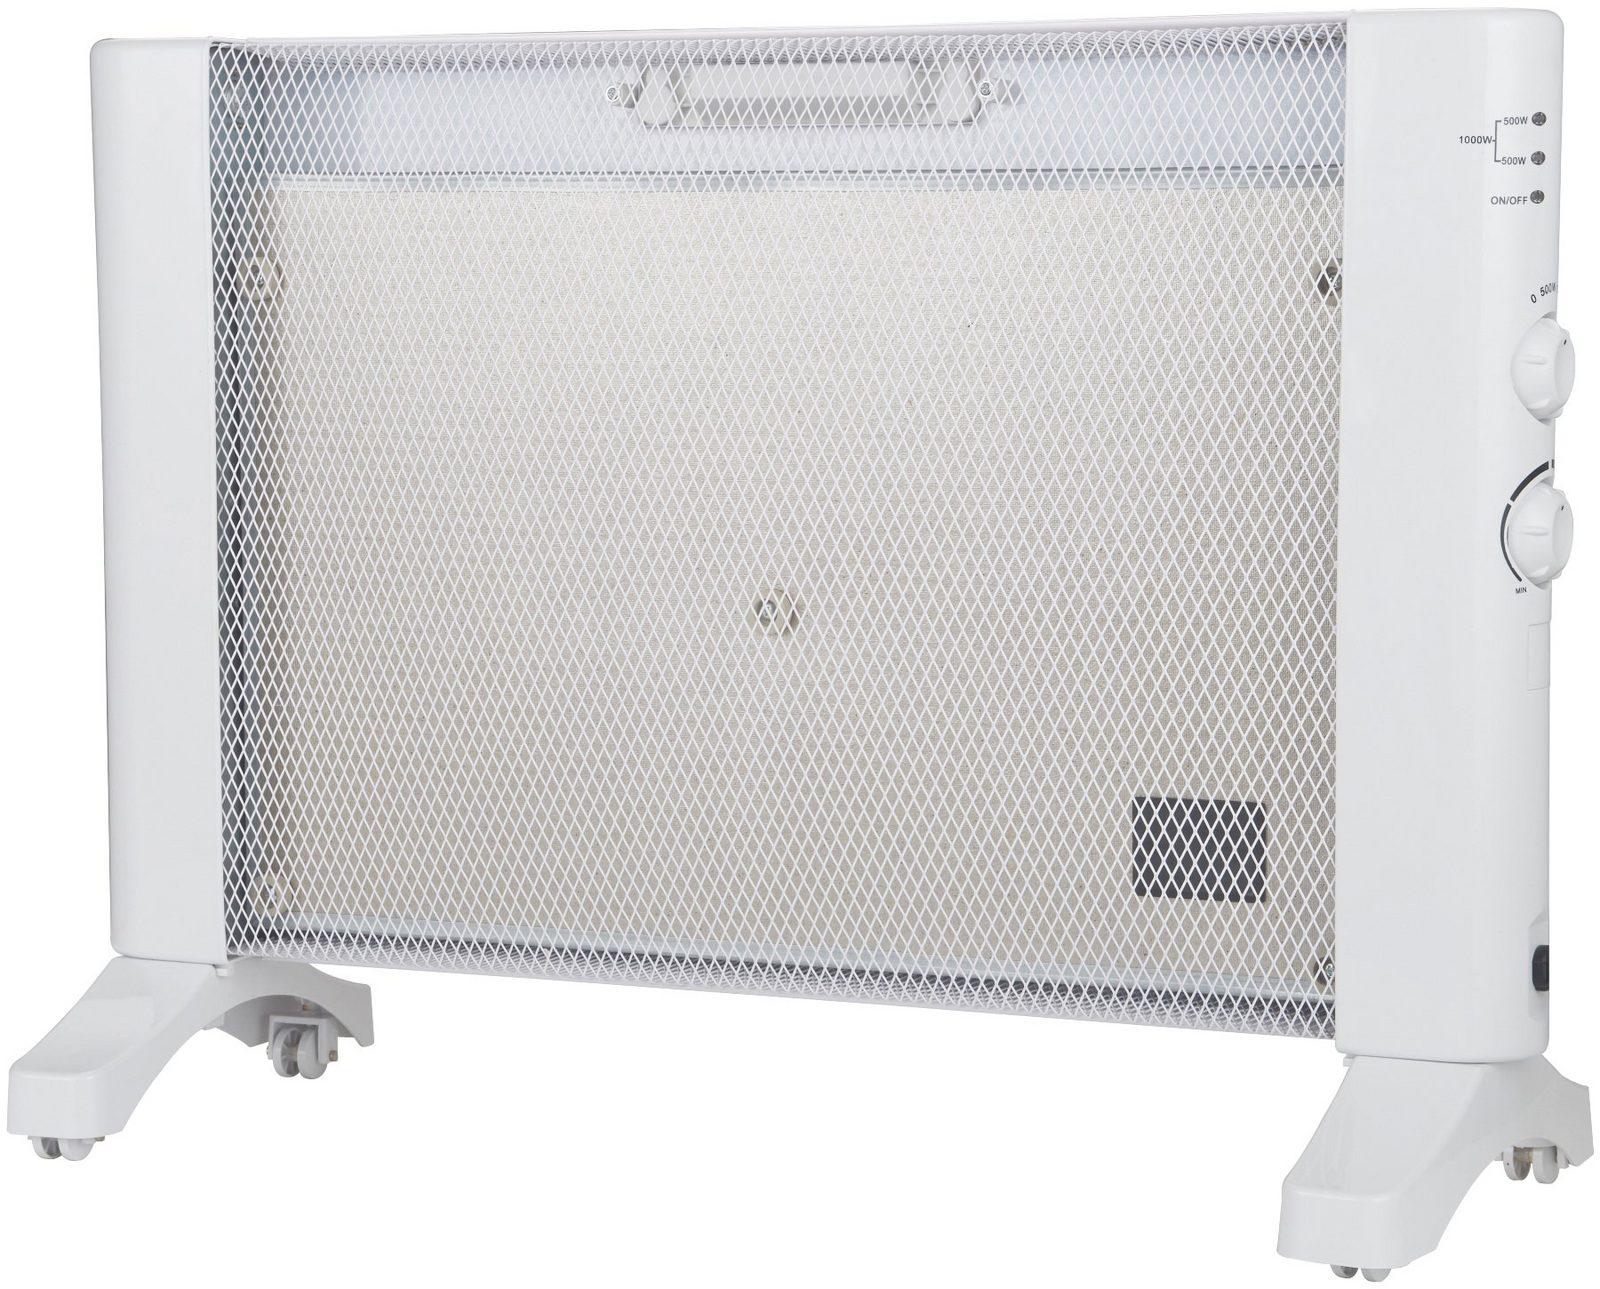 EL FUEGO Wärmewelle »AY699«, Metall, (H/B/T): ca. 47,5x66,5x25,5 cm jetztbilligerkaufen